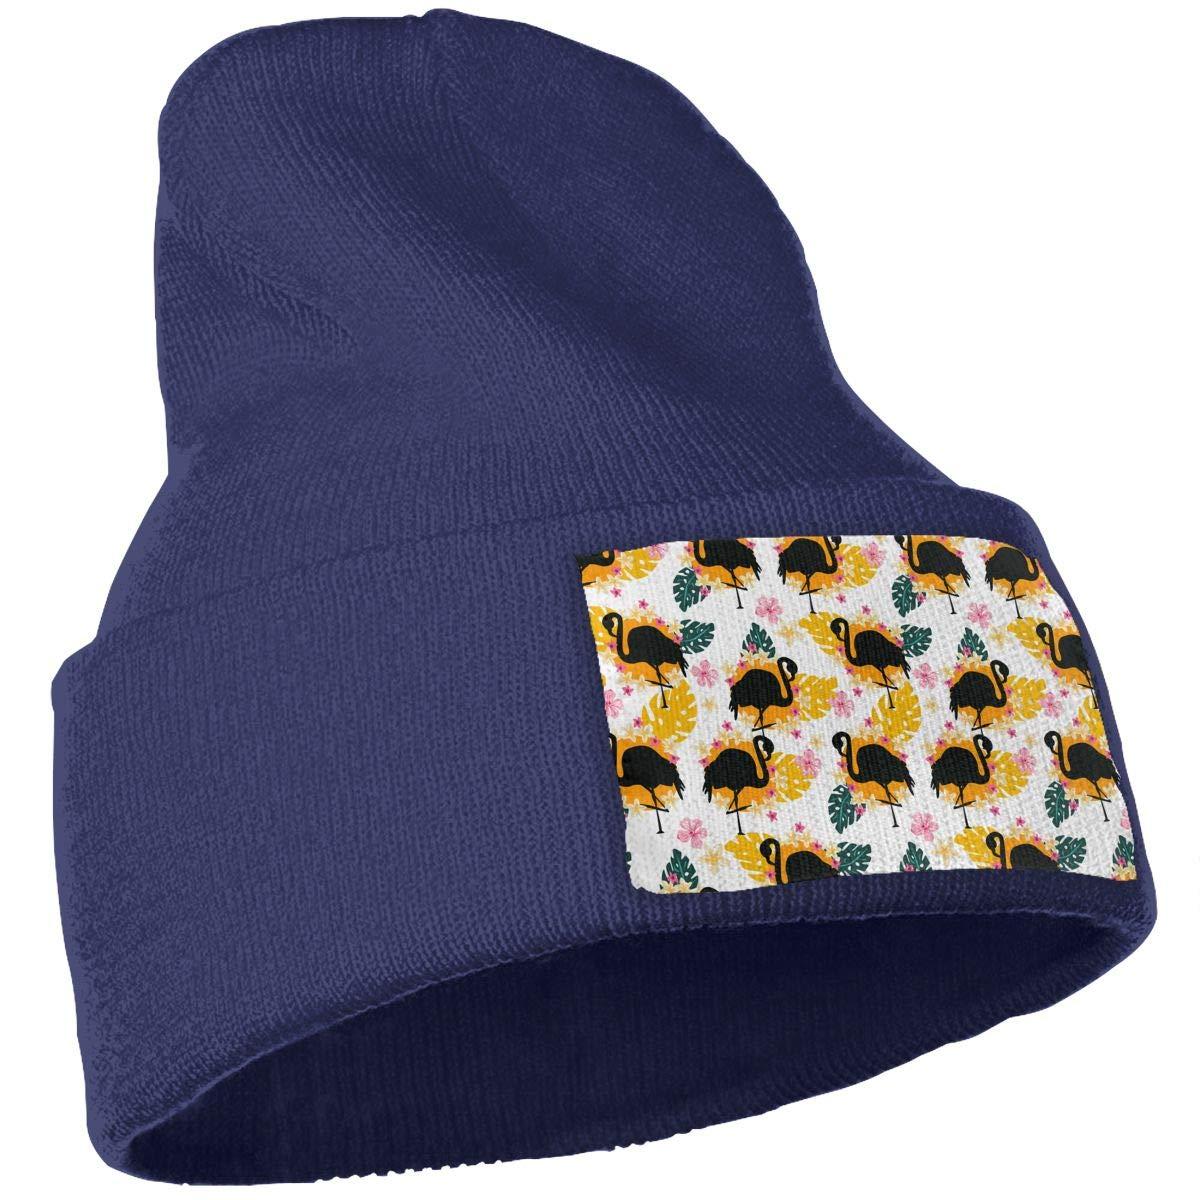 Black Flamingos Yellow Flowers Unisex Fashion Knitted Hat Luxury Hip-Hop Cap